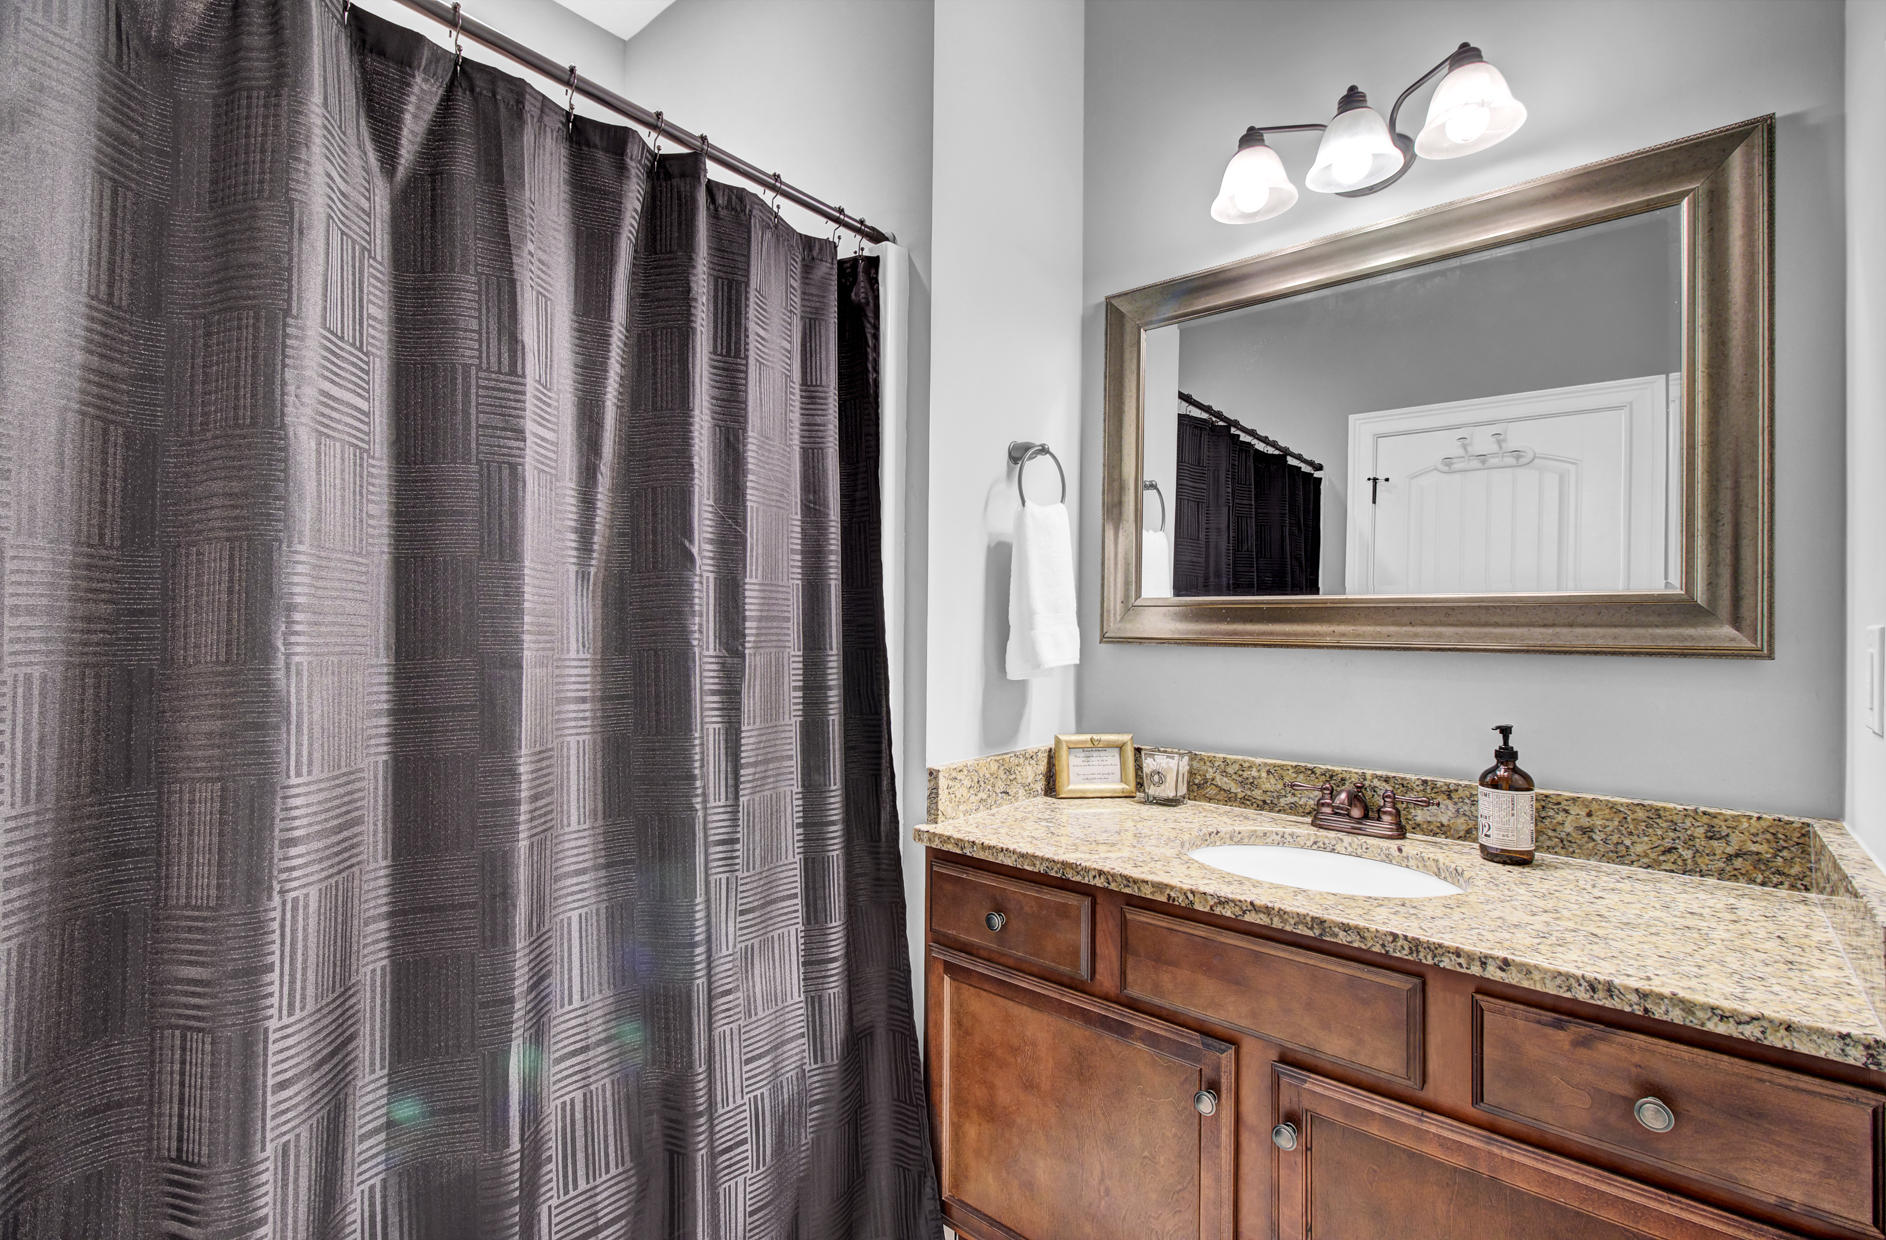 Carol Oaks Town Homes Homes For Sale - 2956 Emma, Mount Pleasant, SC - 1